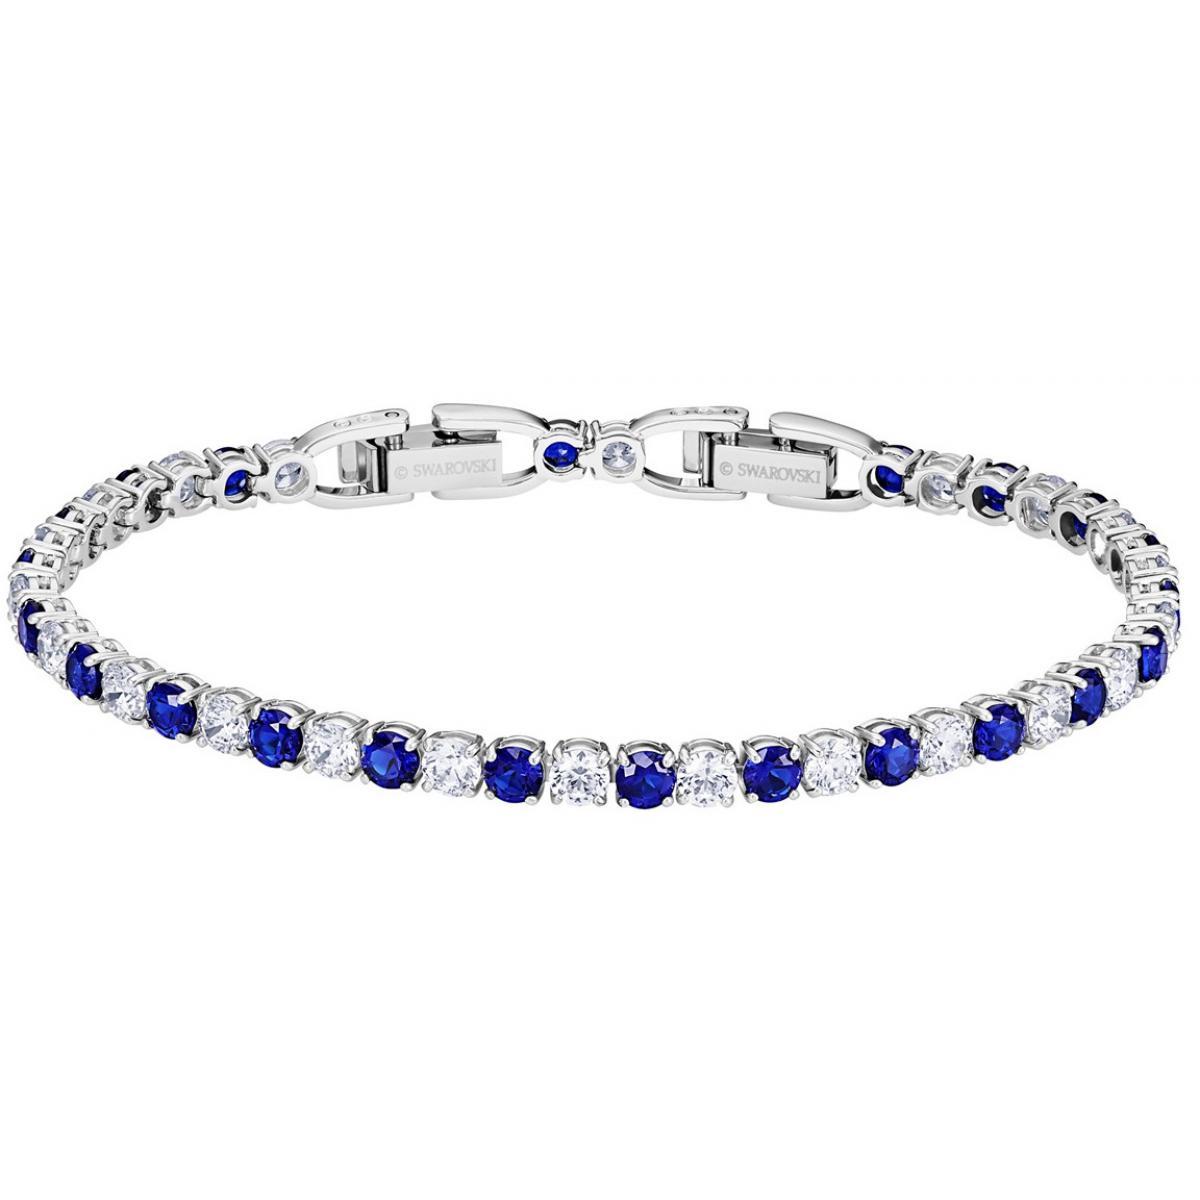 Bracelet Swarovski 5506253 - Tennis Métal Rhodié Pierres en cristal bleu  serti griffe Femme